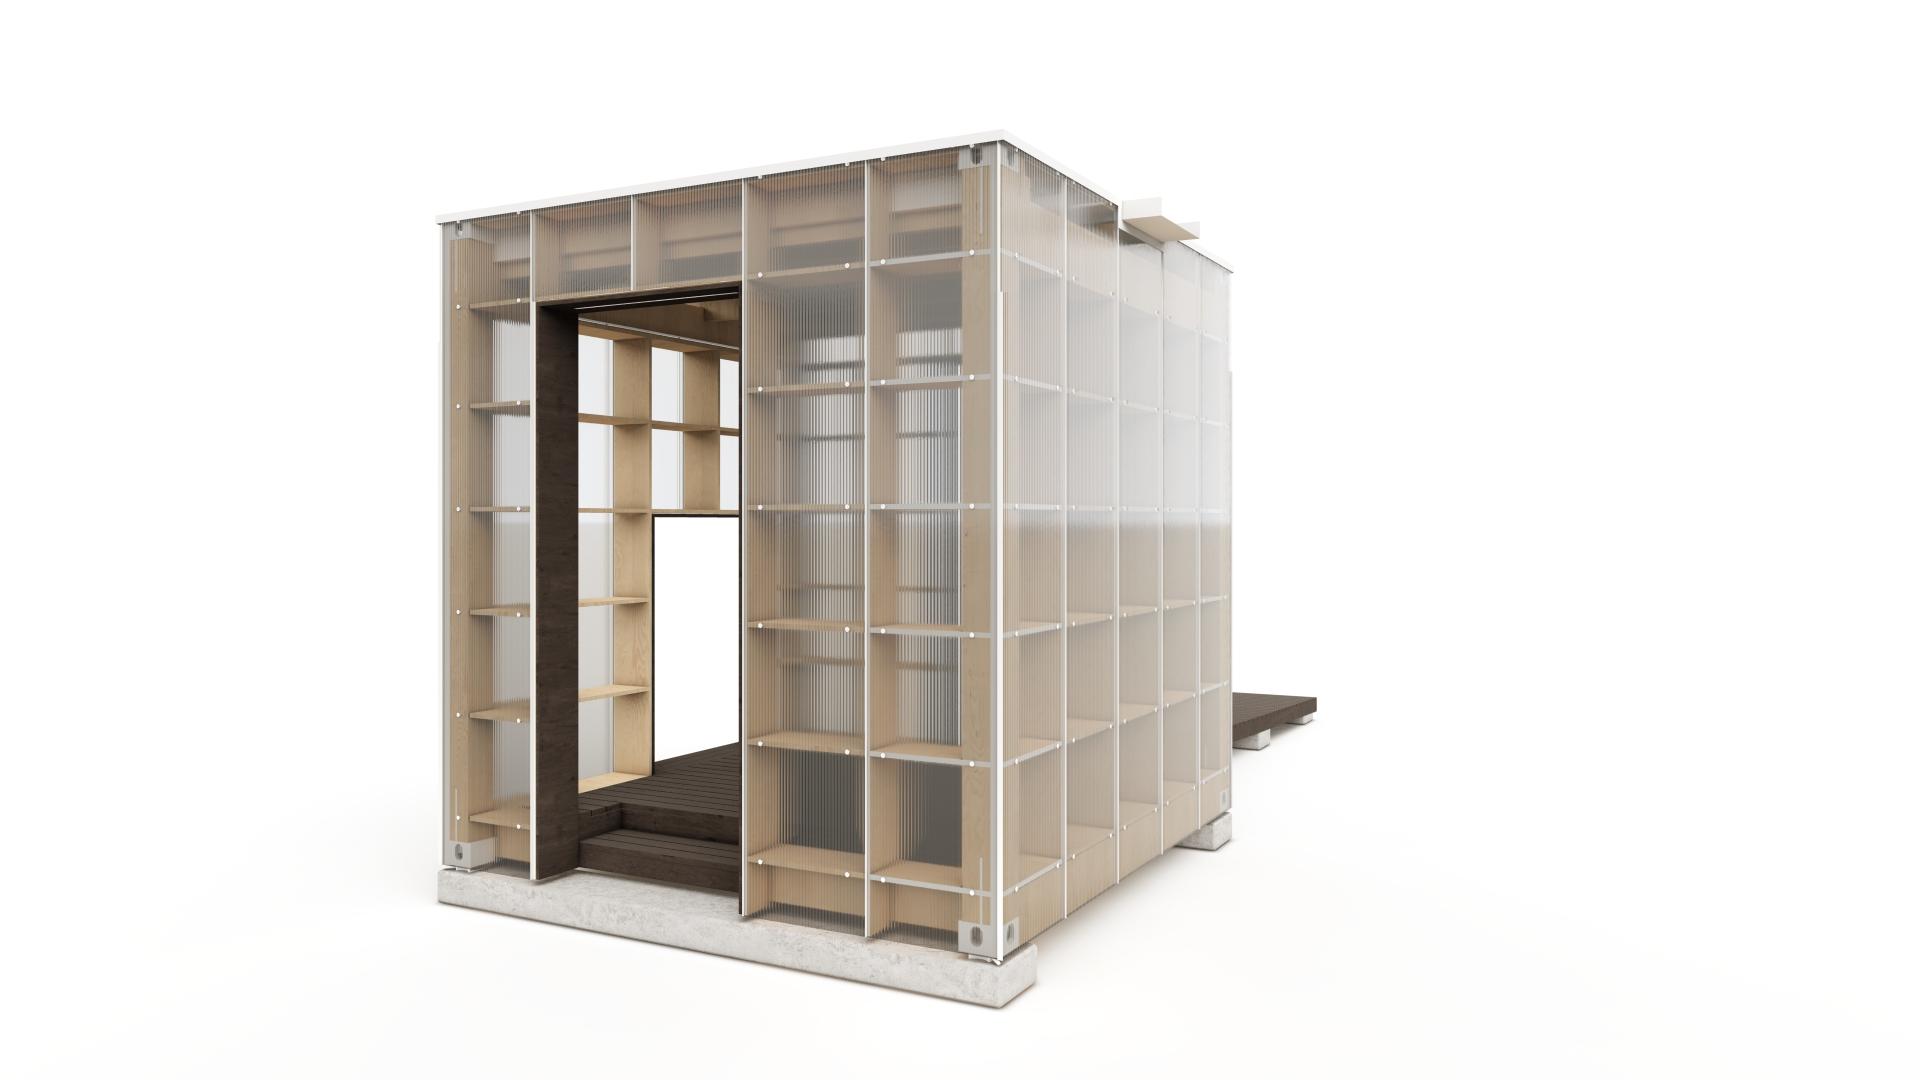 Cuboids - 369 Pattern Buildings project